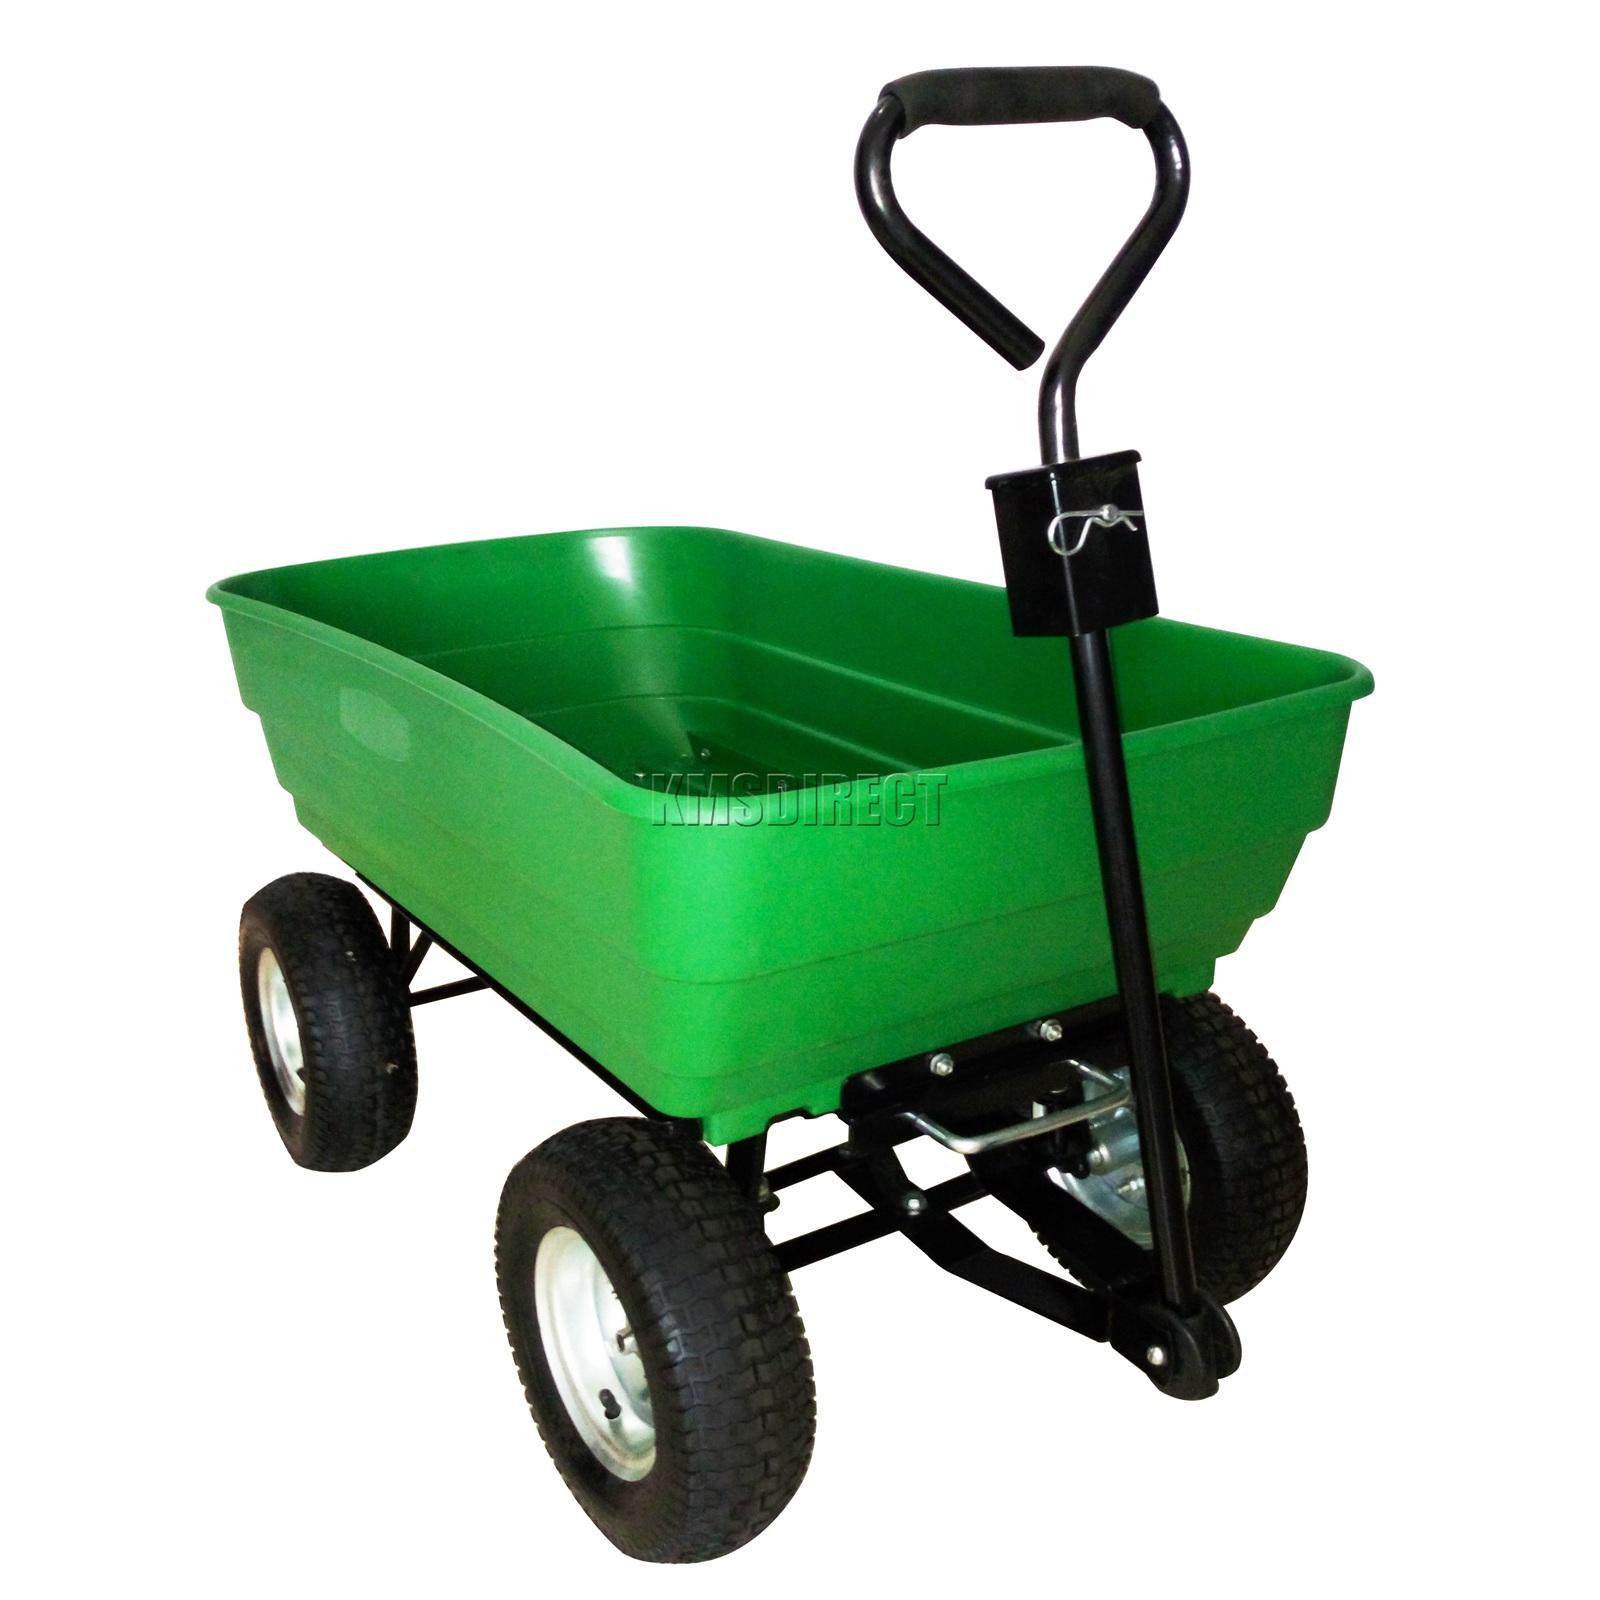 FoxHunter-Heavy-Duty-Garden-Dump-Truck-Tipping-Trailer-Trolley-Cart-Wheelbarrow miniatuur 32